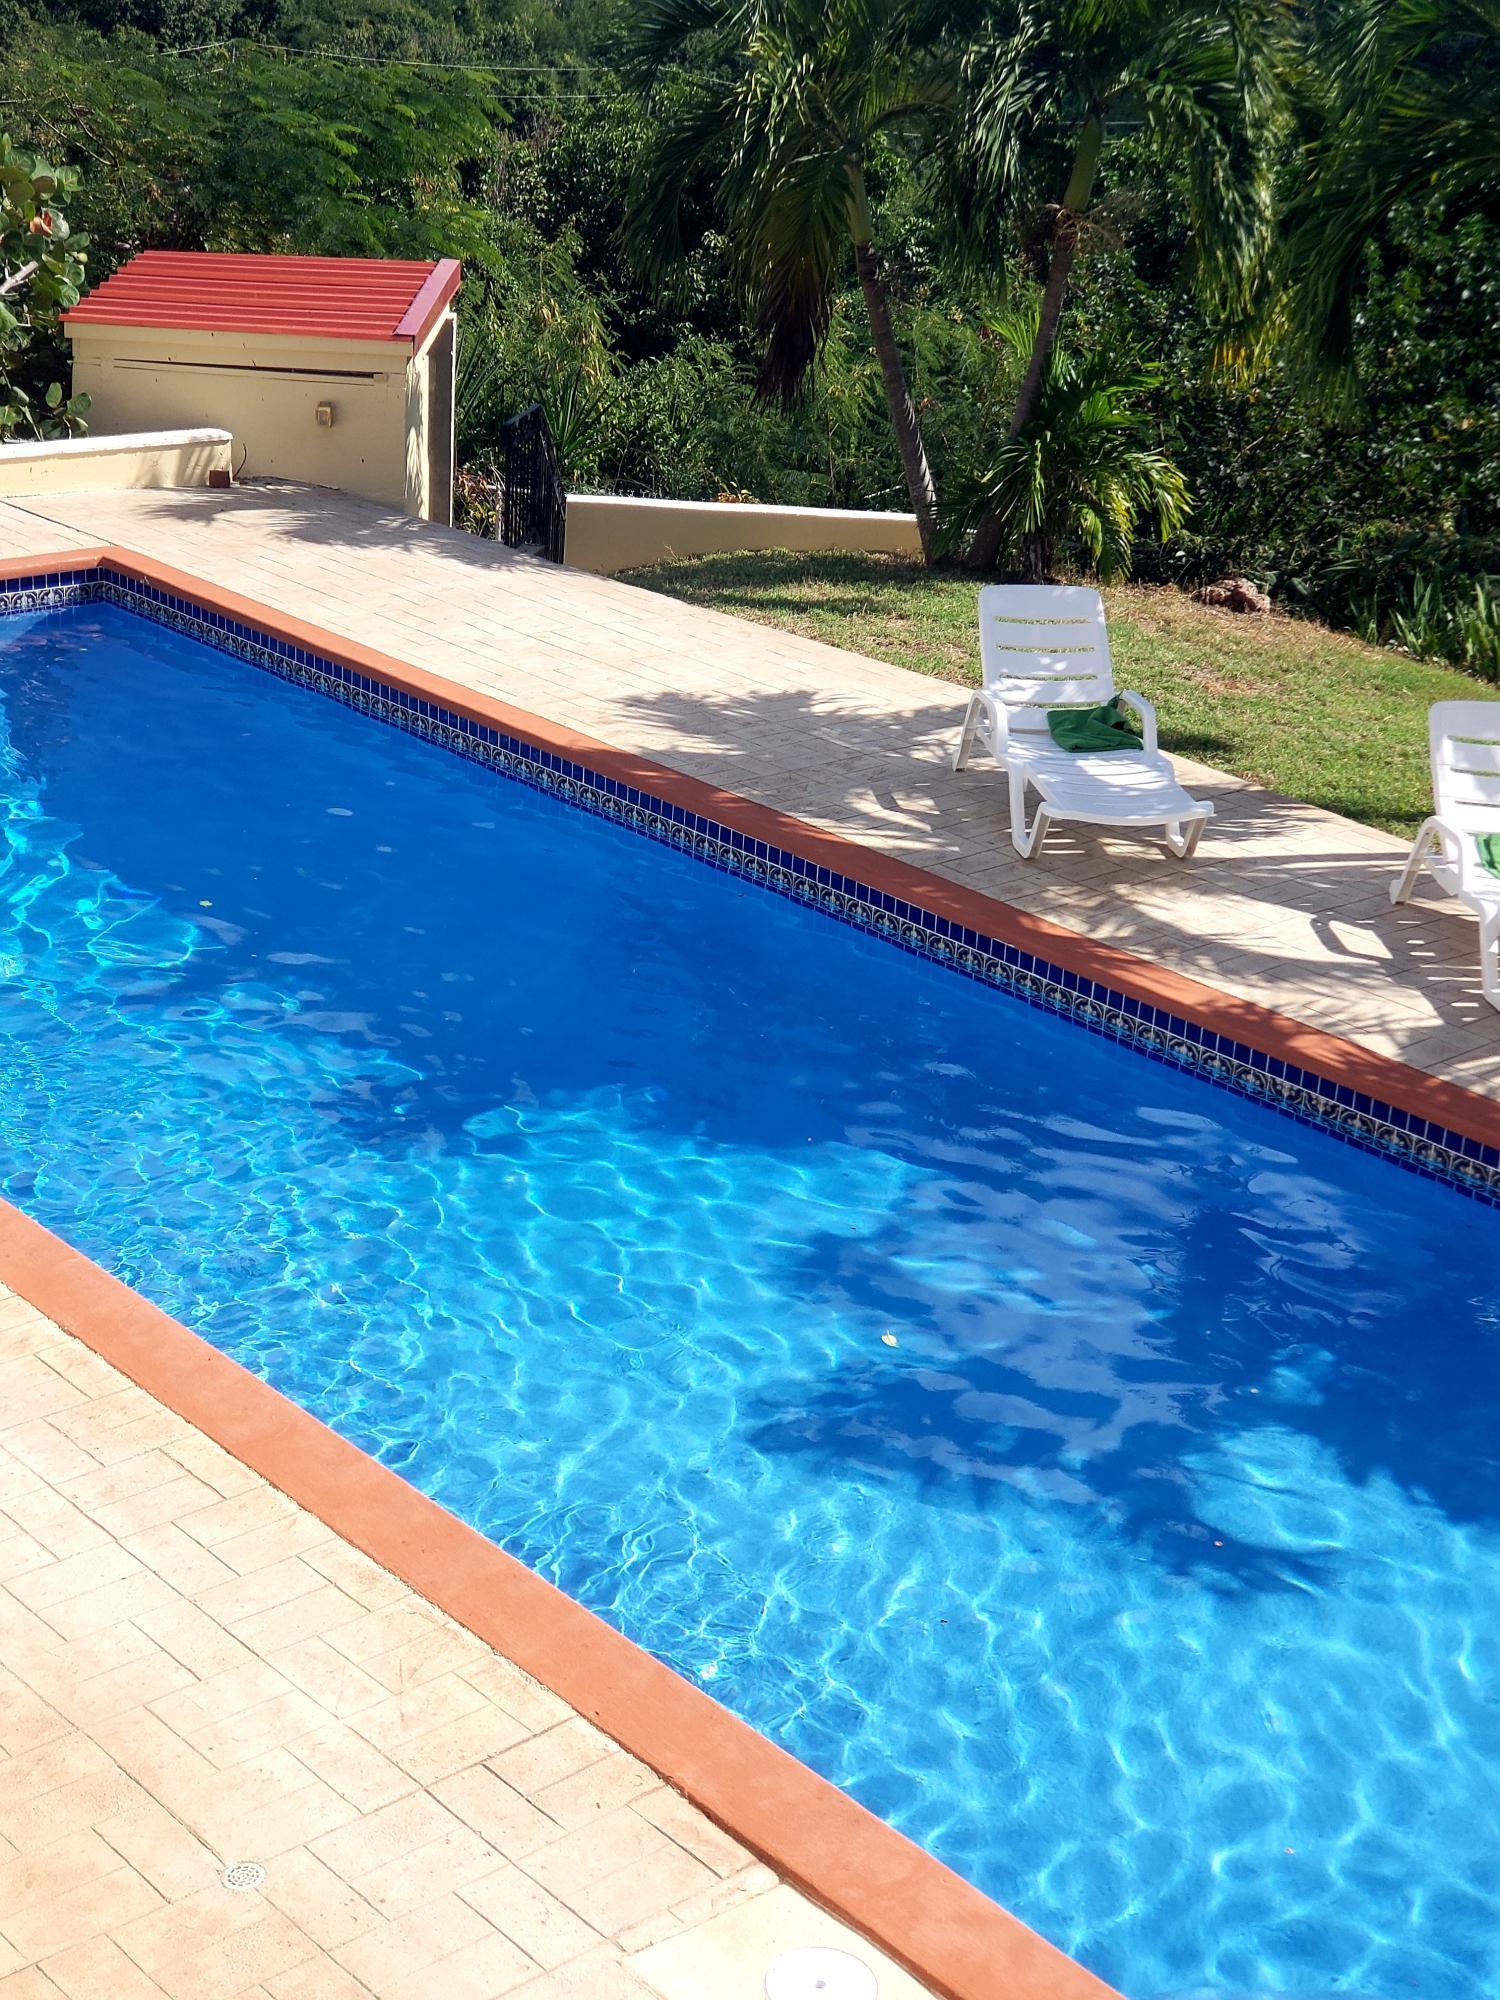 Single Family Home for Sale at 4 Grange CO 4 Grange CO St Croix, Virgin Islands 00820 United States Virgin Islands